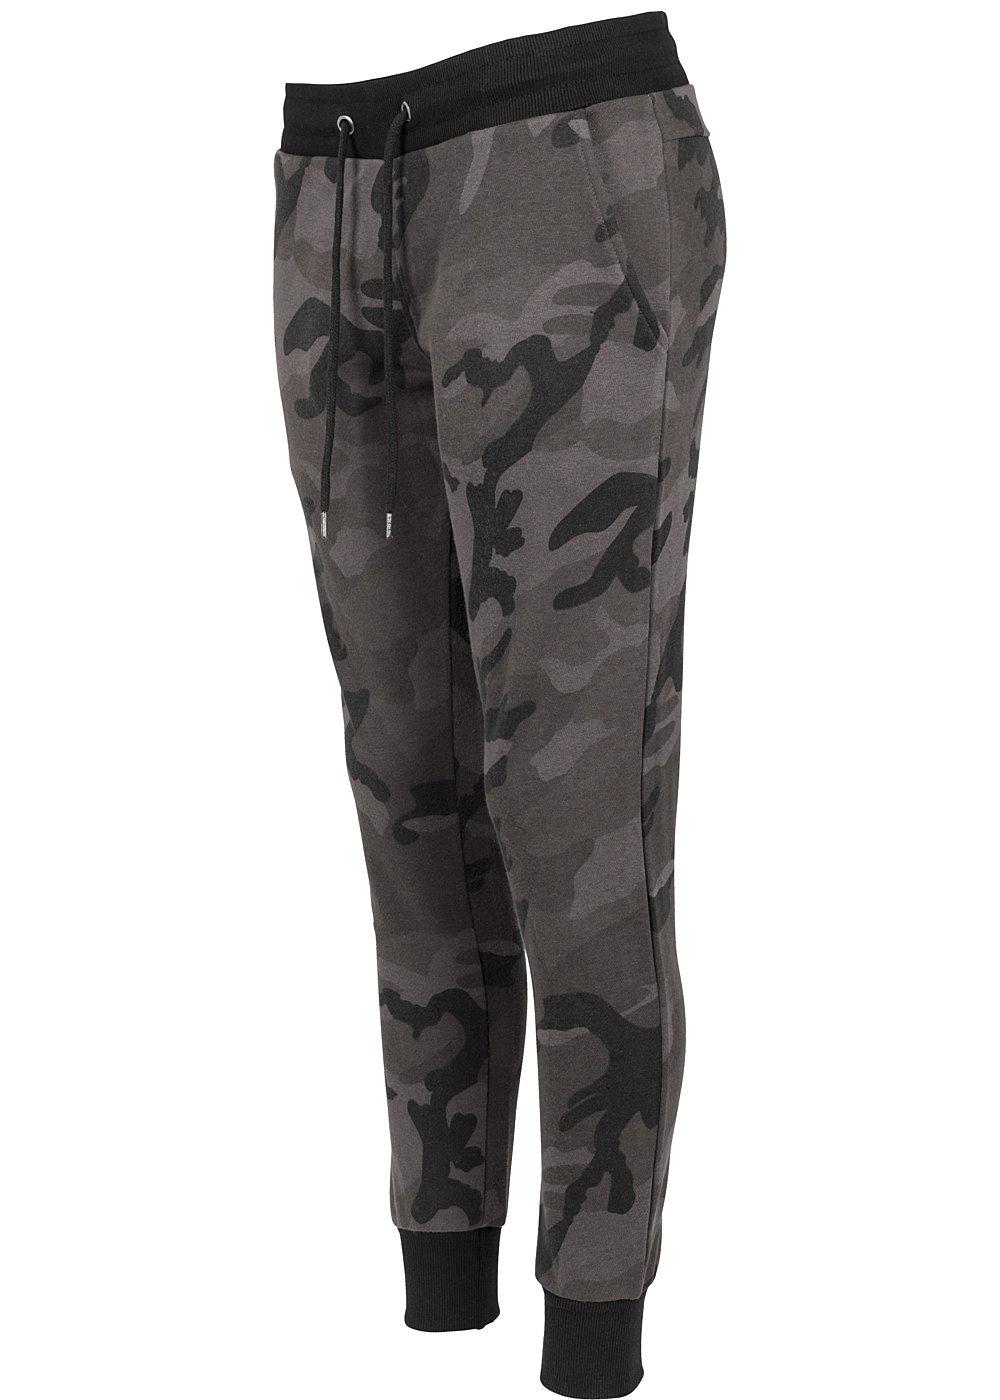 seventyseven lifestyletb damen terry jogging pants camouflage design dunkel camouflage. Black Bedroom Furniture Sets. Home Design Ideas